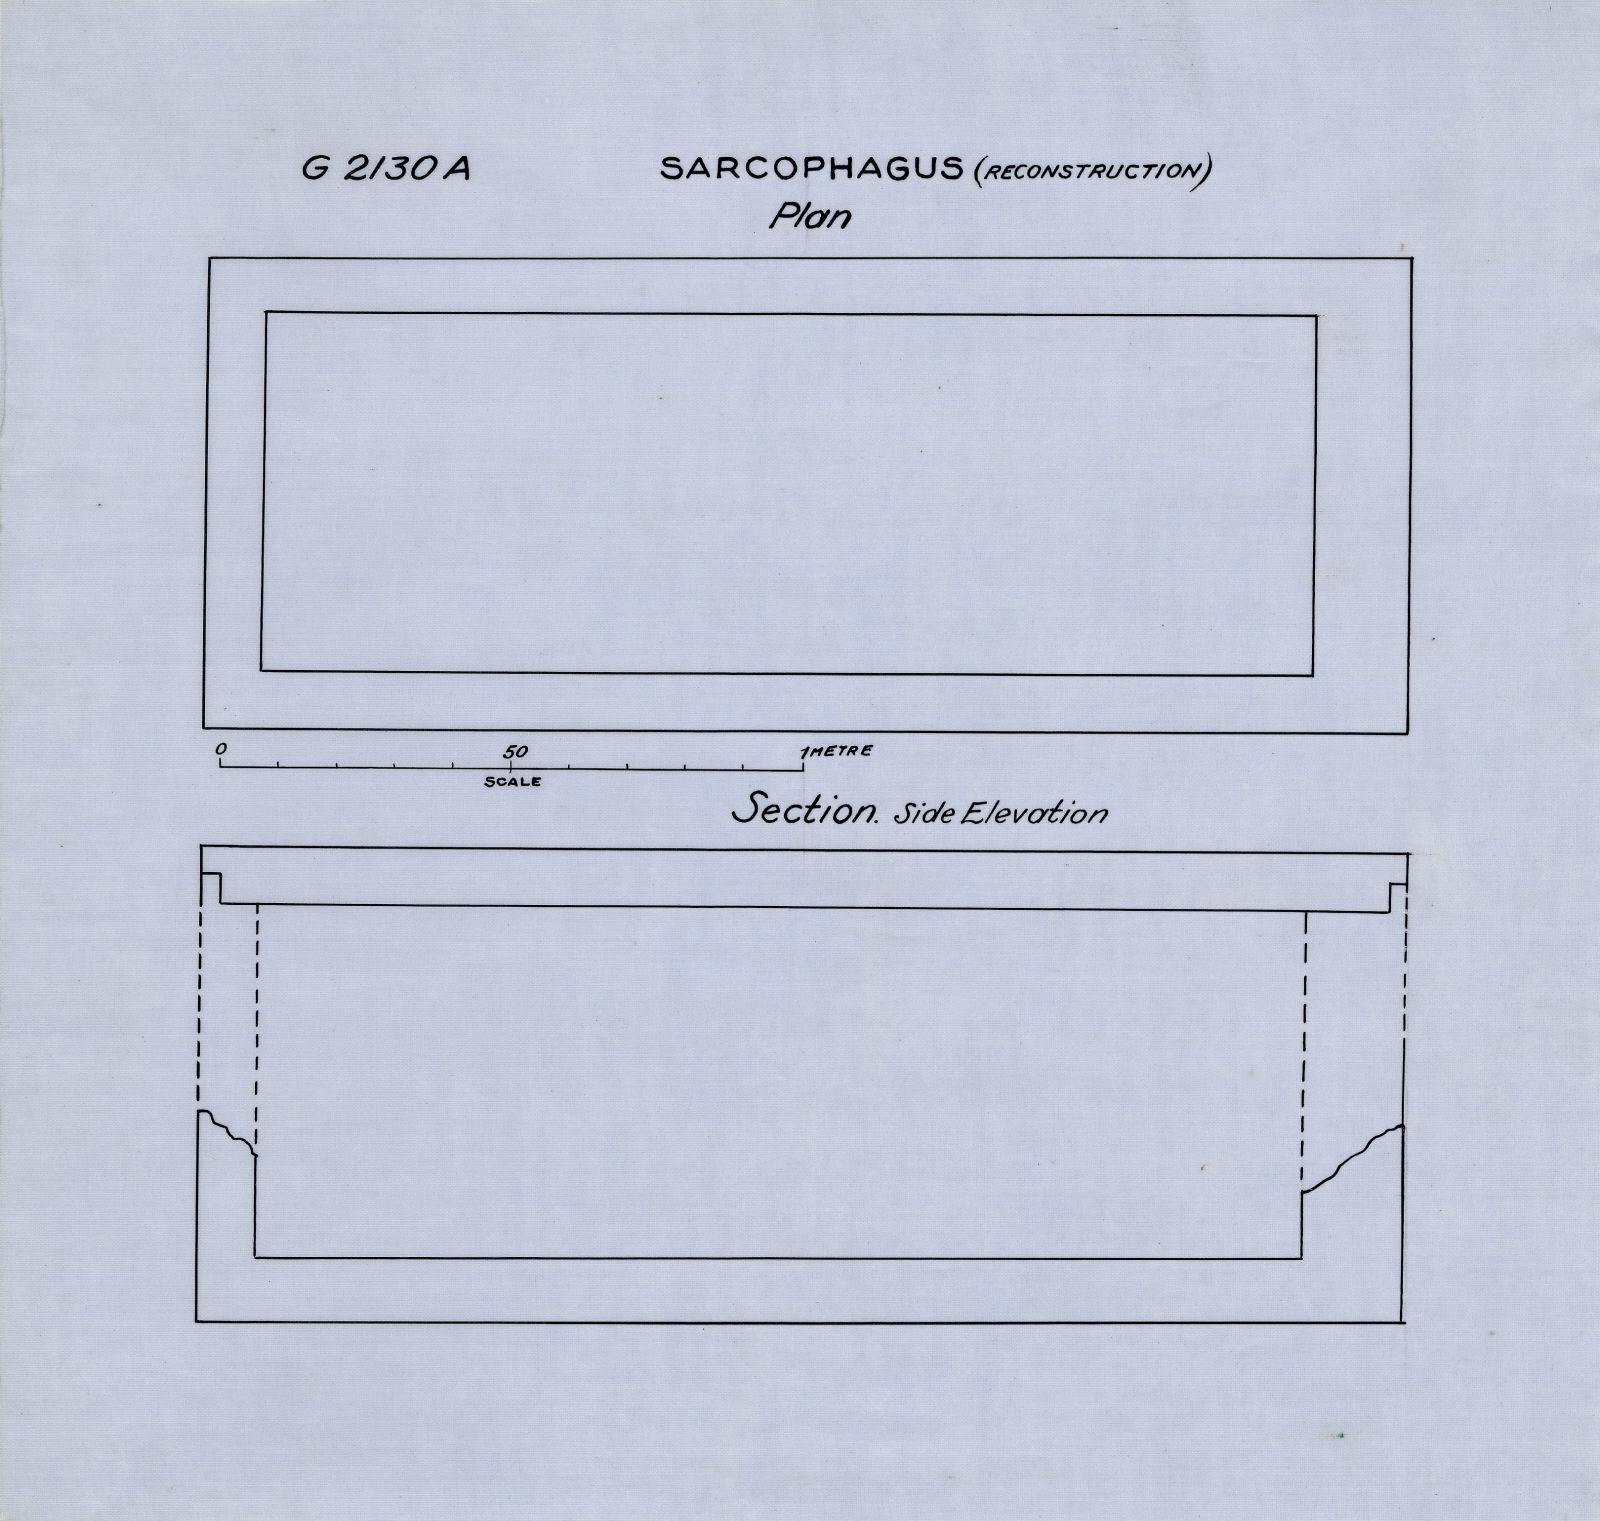 Drawings: G 2130, Shaft A: sarcophagus